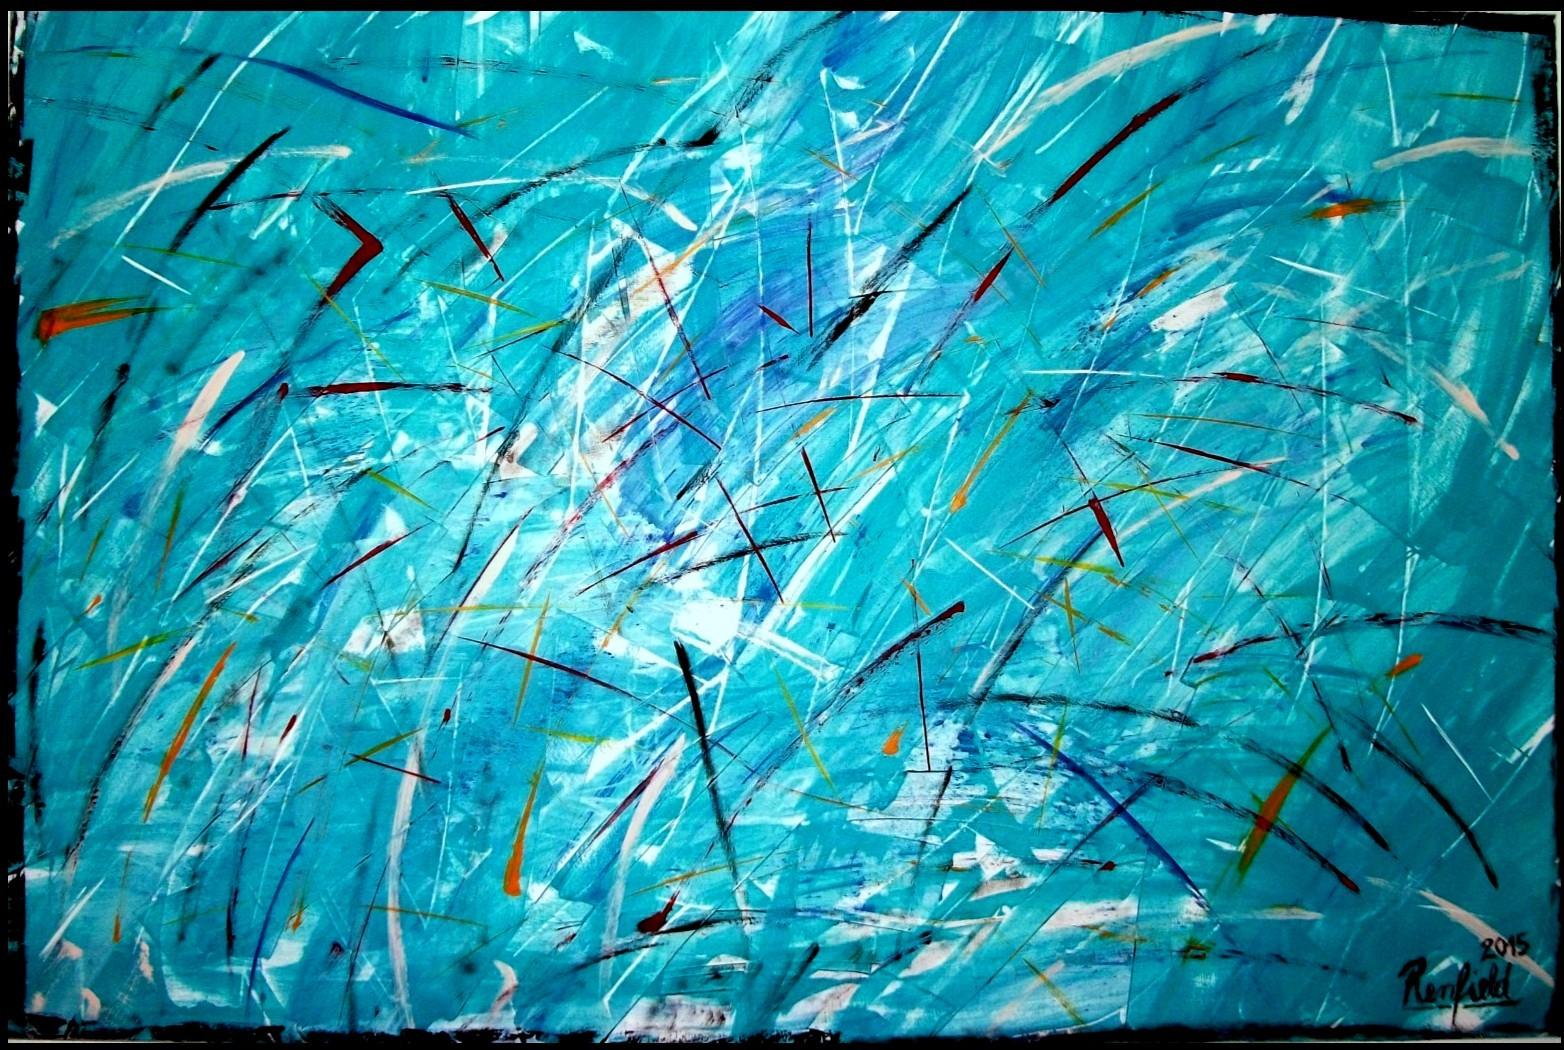 Blue Vision 3 (150 x 100) Acryl auf Leinwand 650 €uro